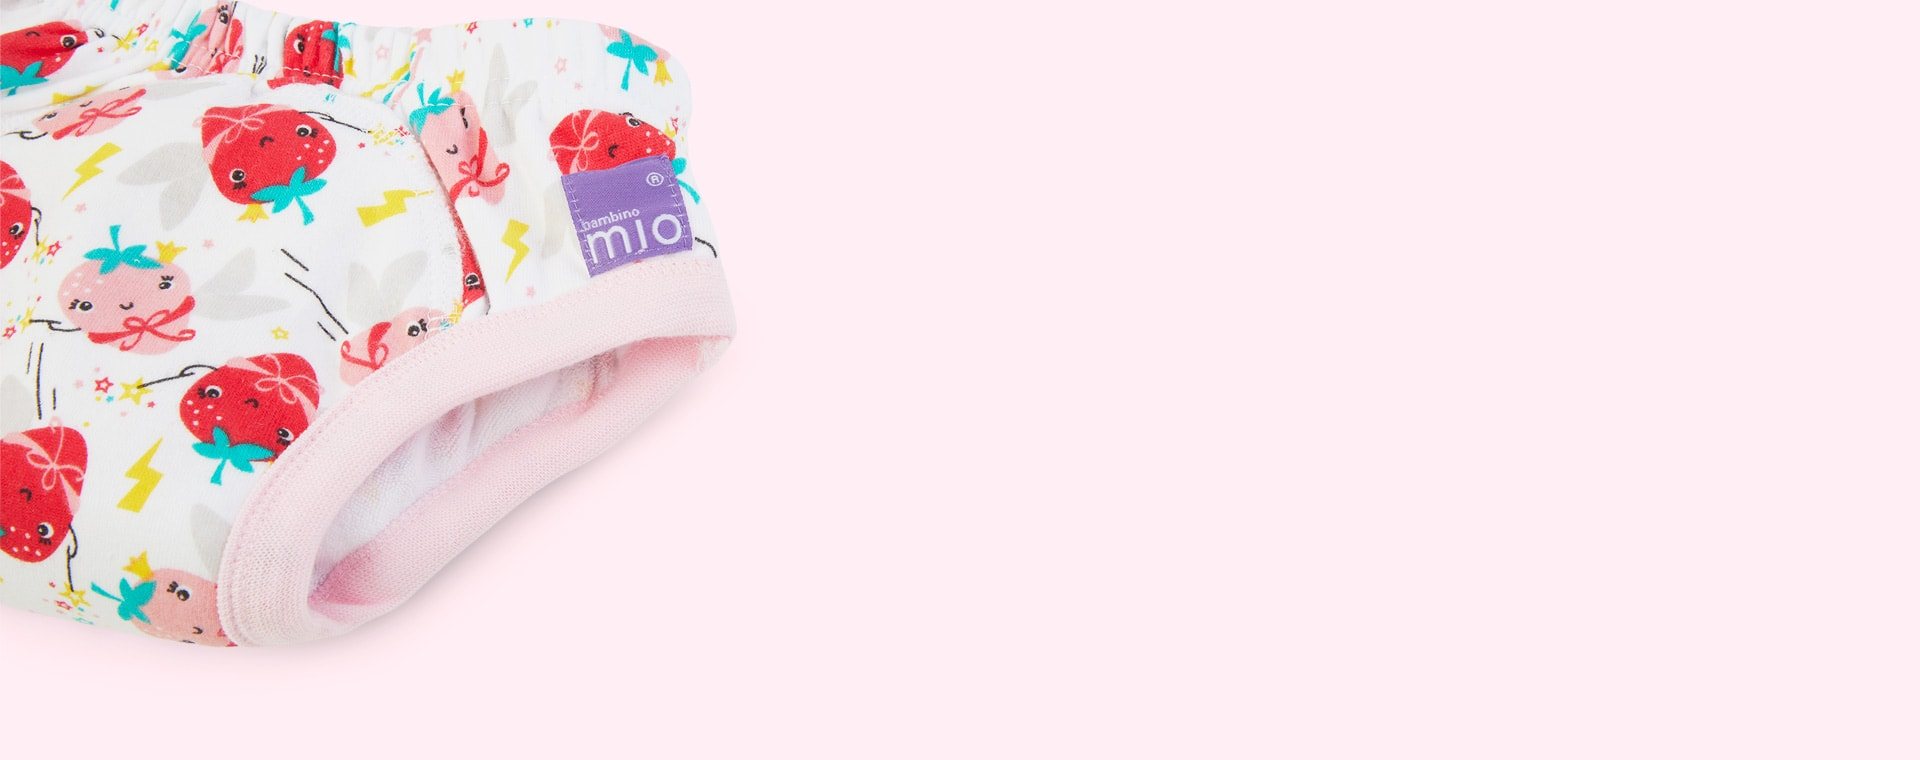 Super Strawb Bambino Mio Potty Training Pant